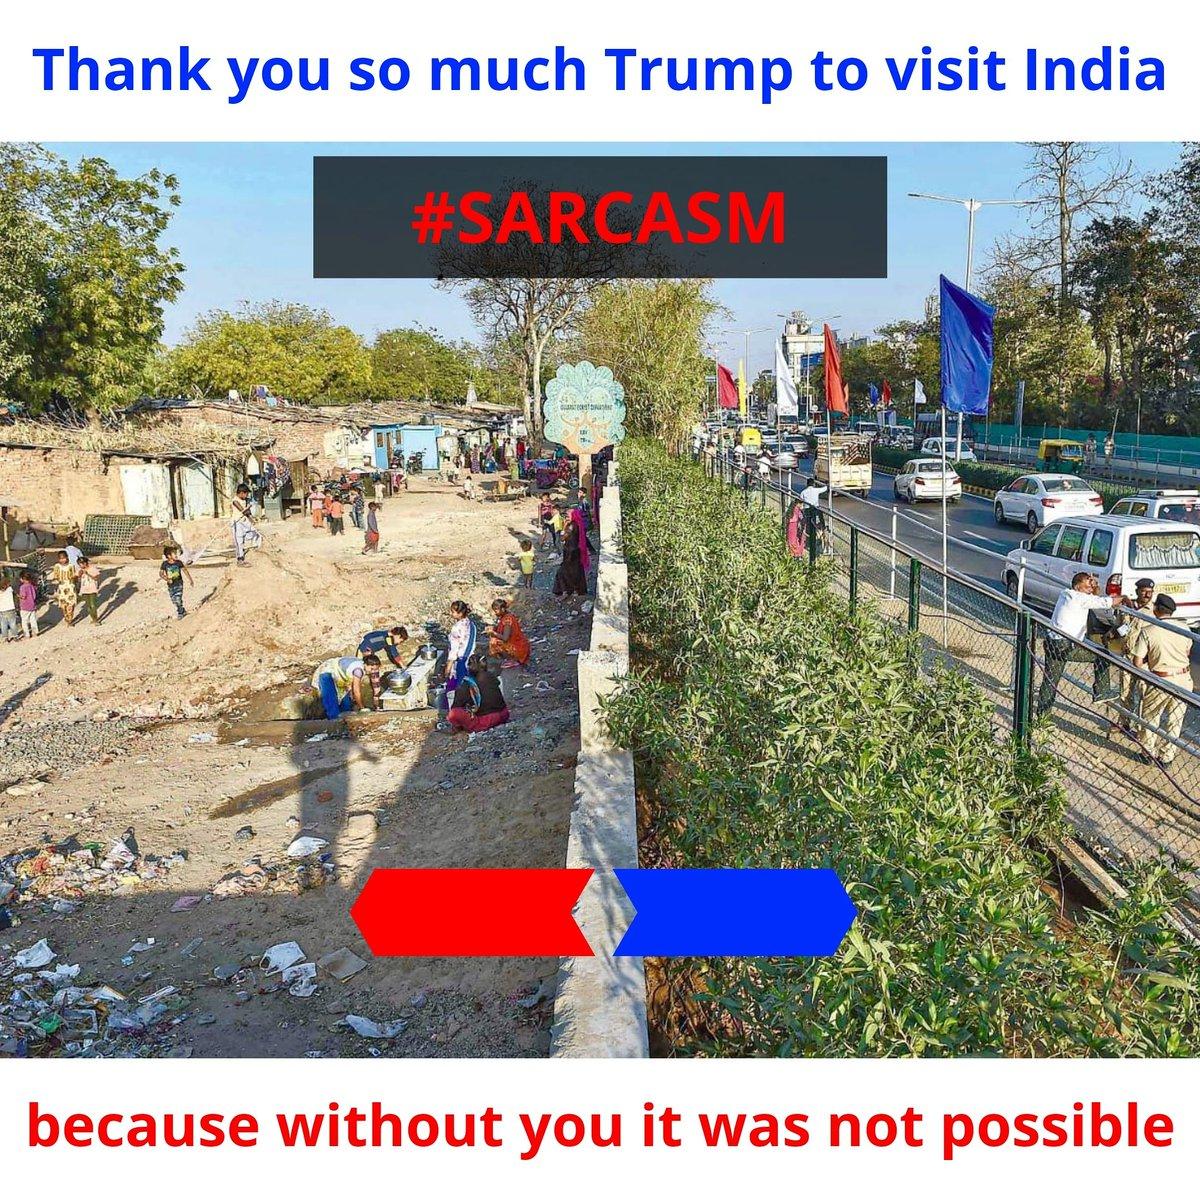 This Change  Because of Trump Visit  #pakistan #usa #trending #memes #life #style #kolkata #beautiful #punjab #jaipur #likes #music #naturephotography #world #Bangalore #hyderabad #bjp #surat #traveler #beauty #ahmedabad #TrumpIndiaVisit #trump #NamasteTrump